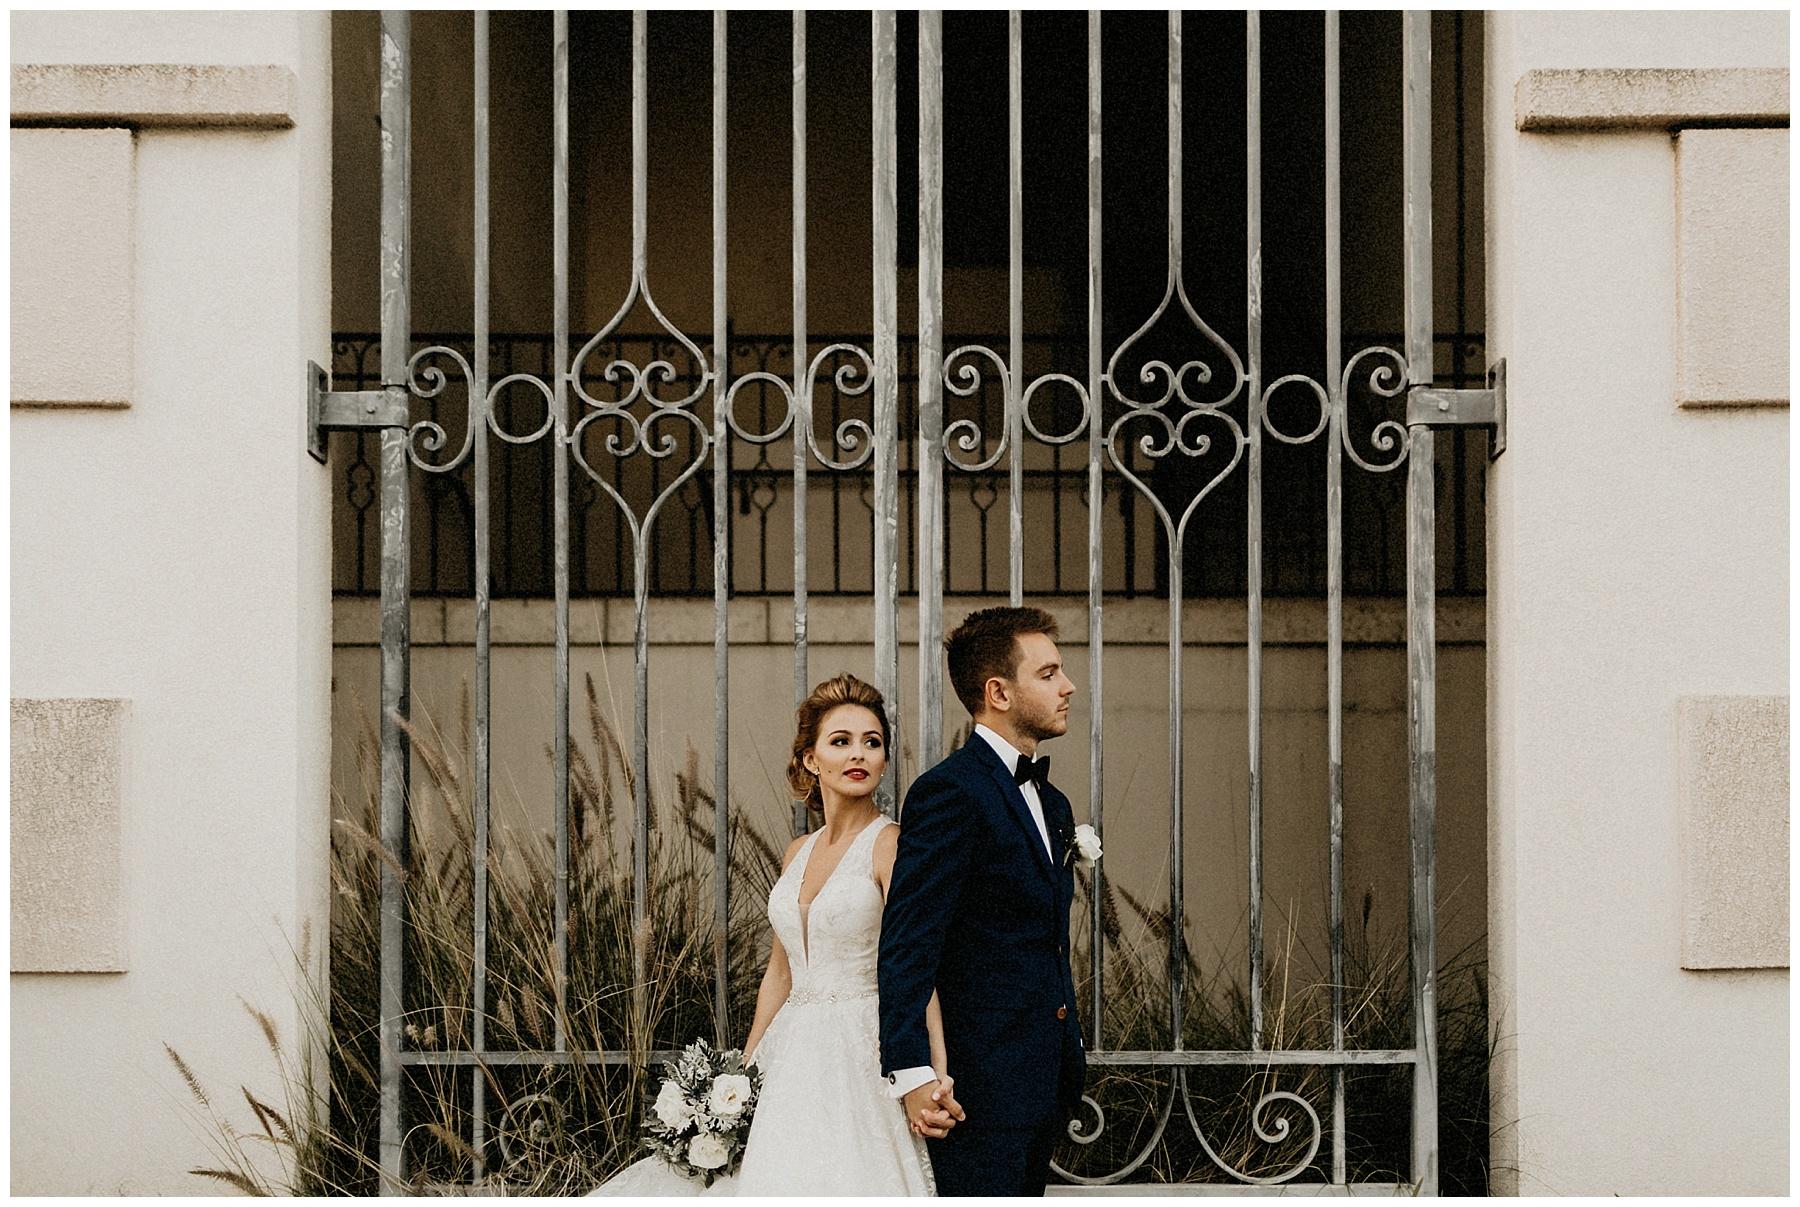 Jake + Johanna | Tampa Wedding